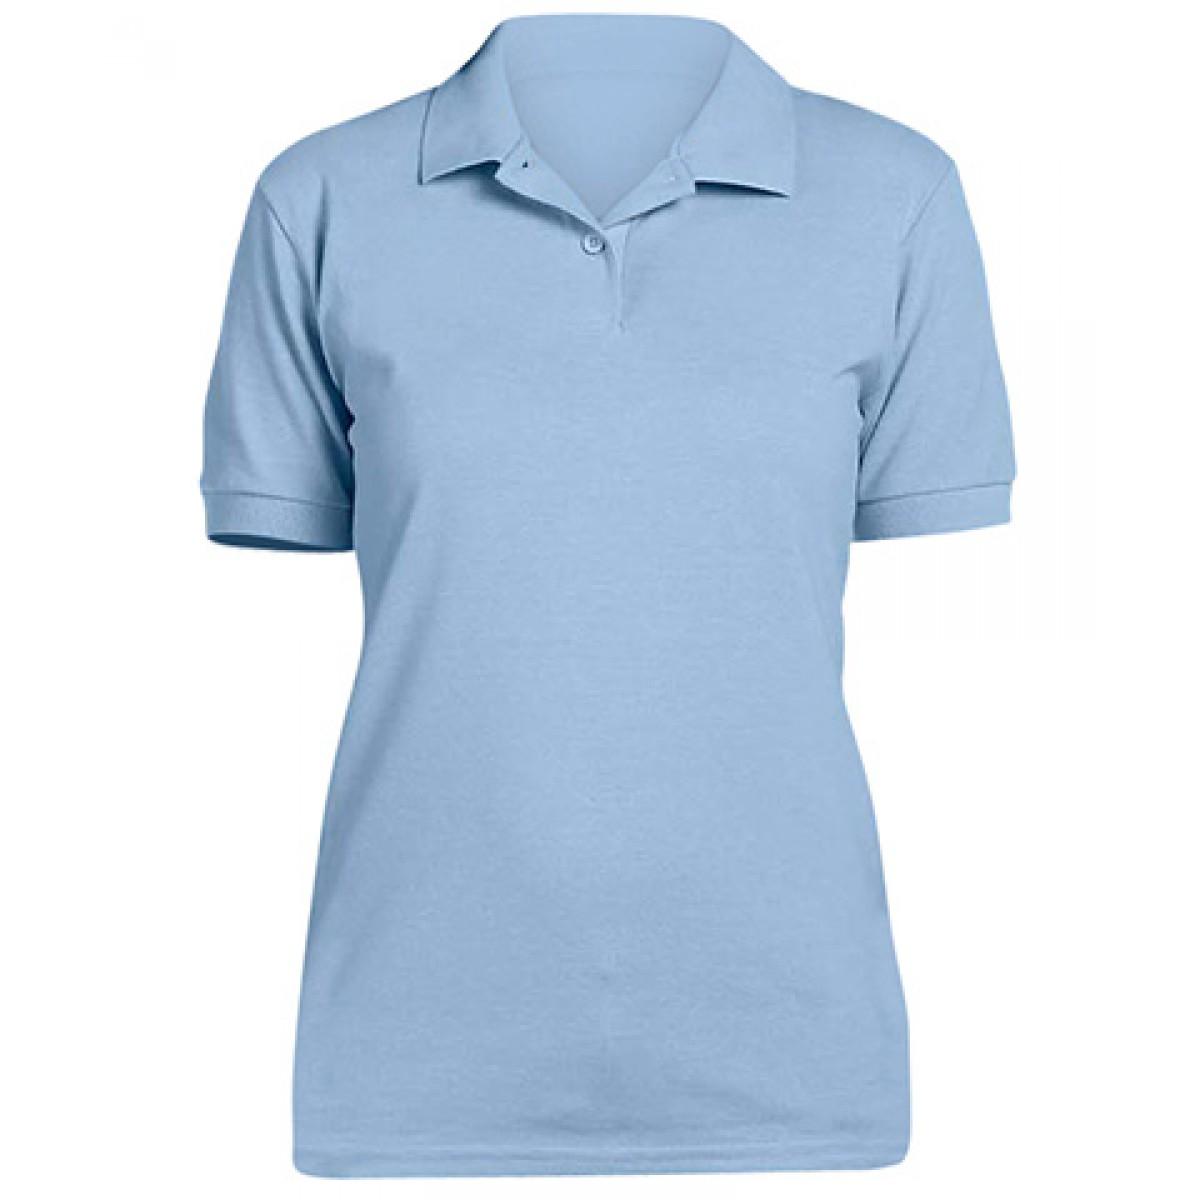 Ladies' 6.5 oz. Piqué Sport Shirt-Blue-XL